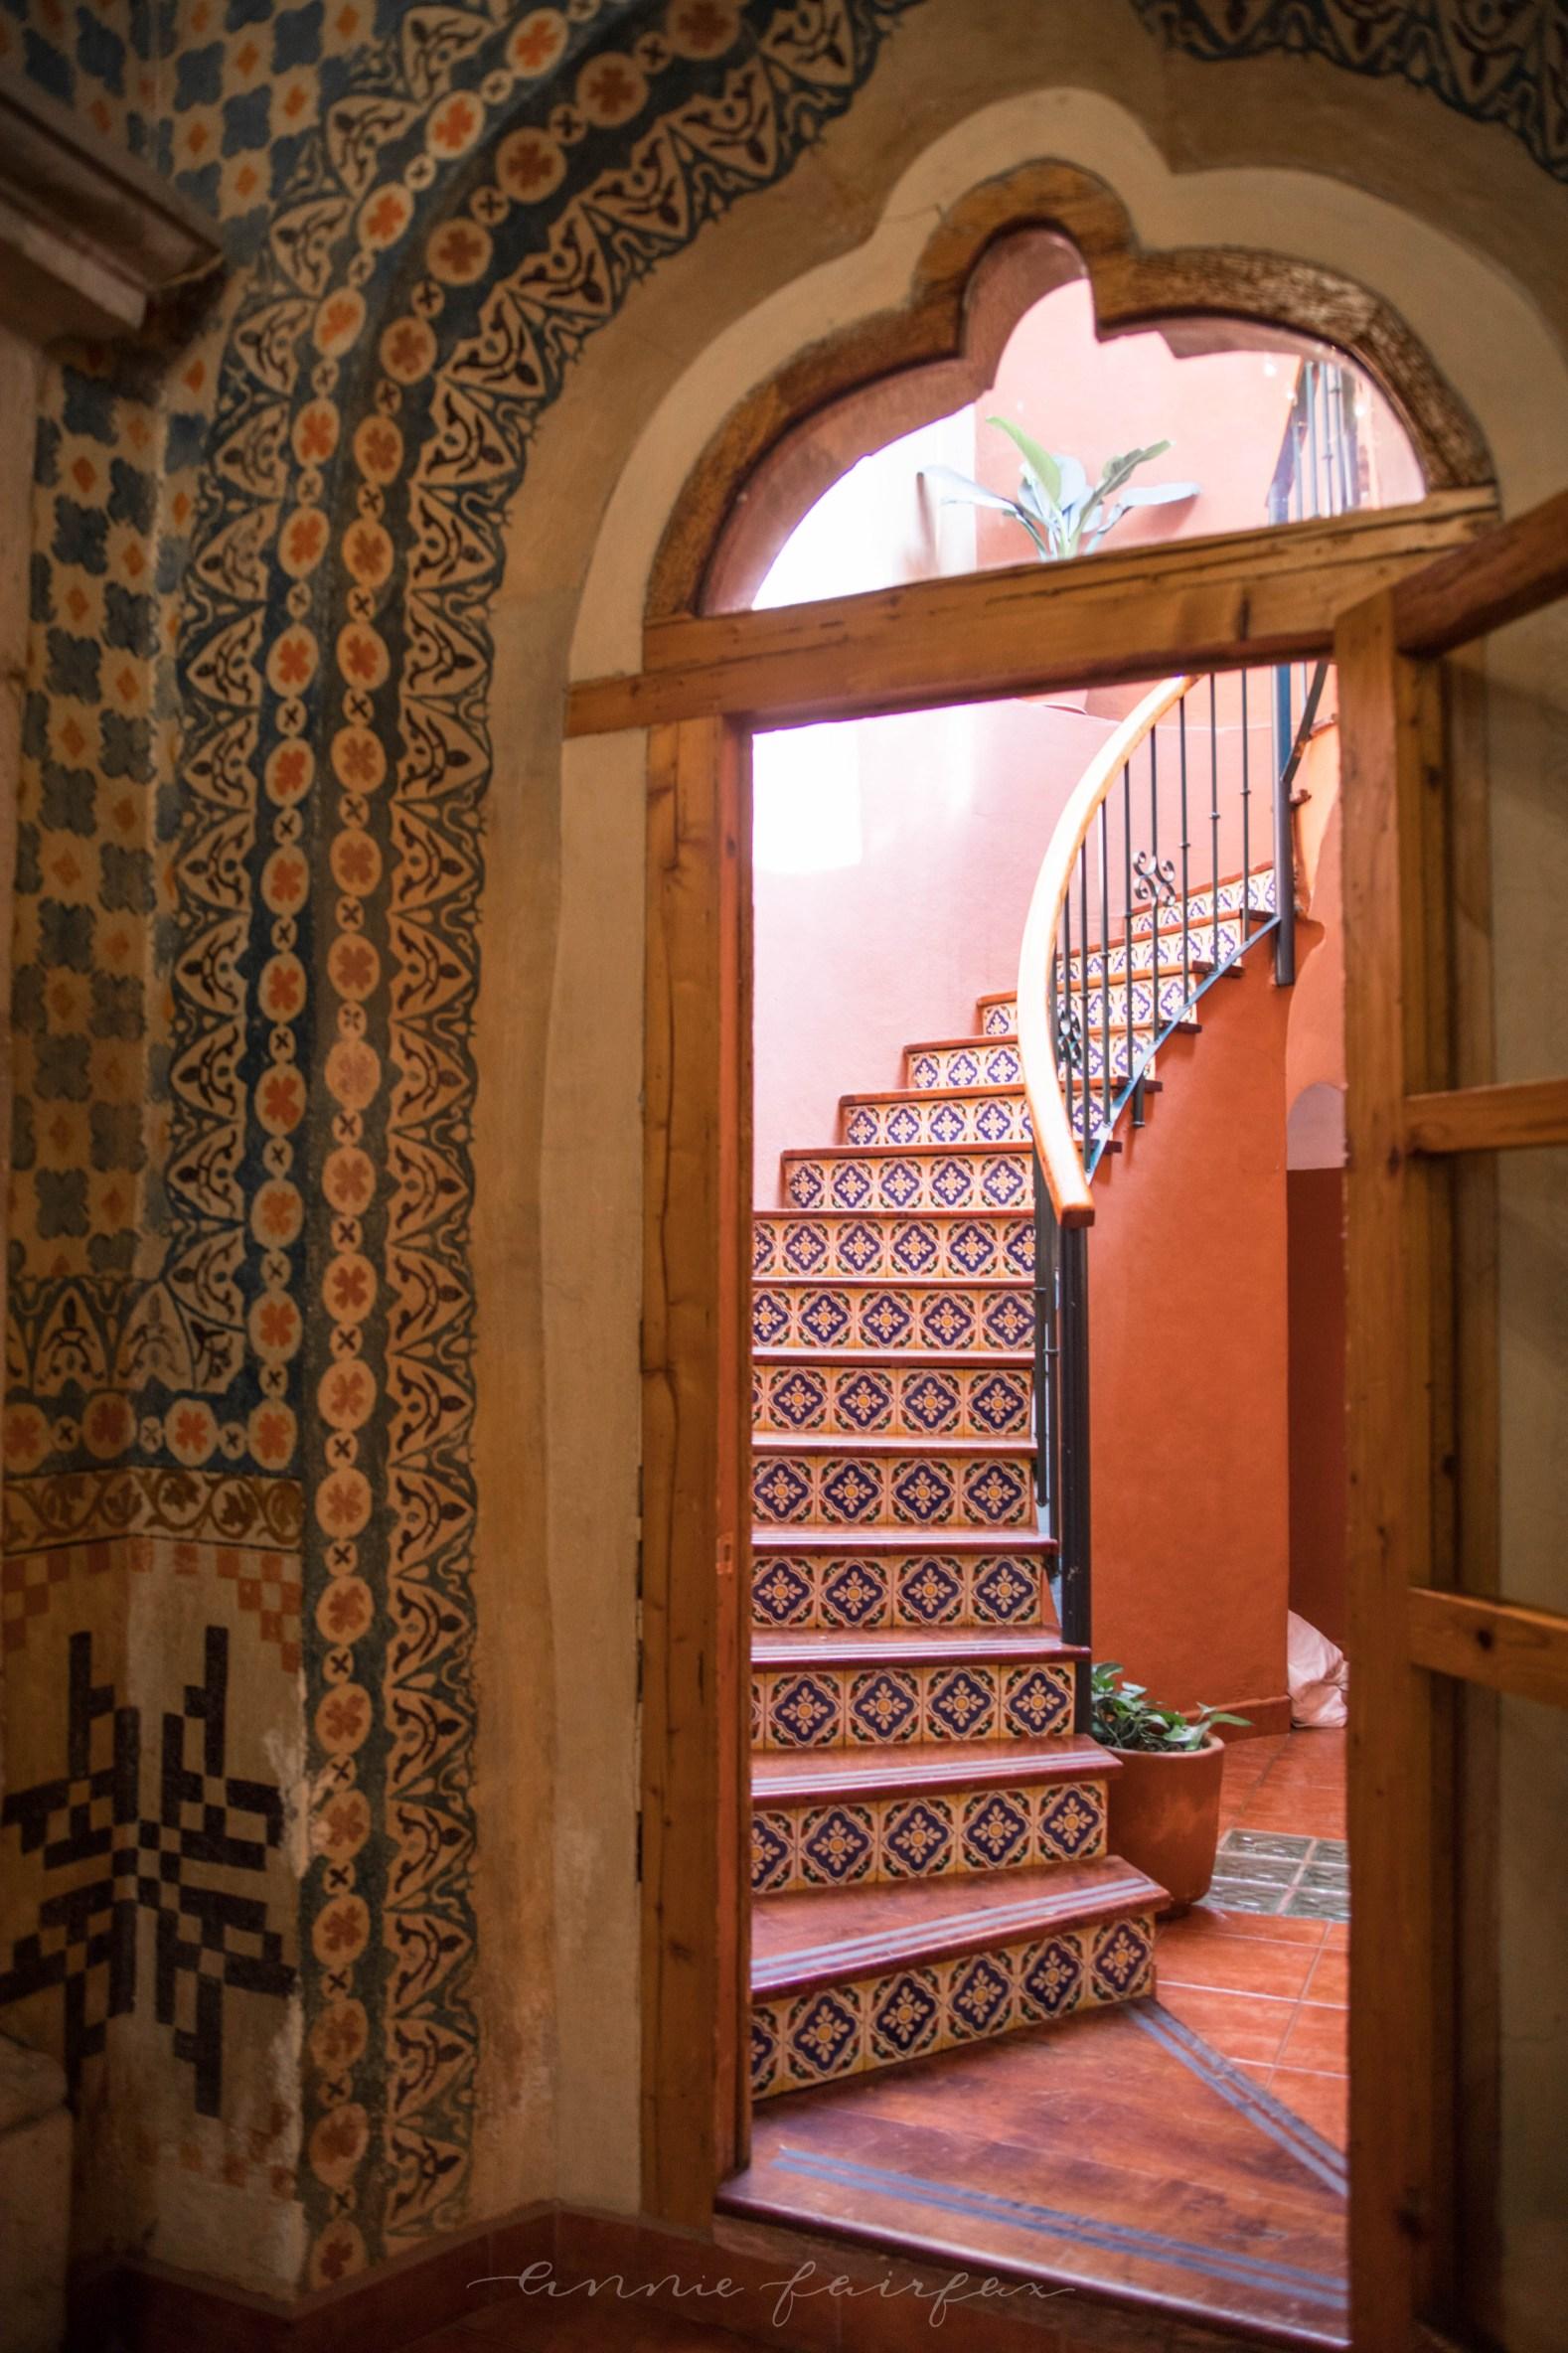 Hotel Casa de la Marquesa English Review Queretaro Mexico Luxury Hotels of the World